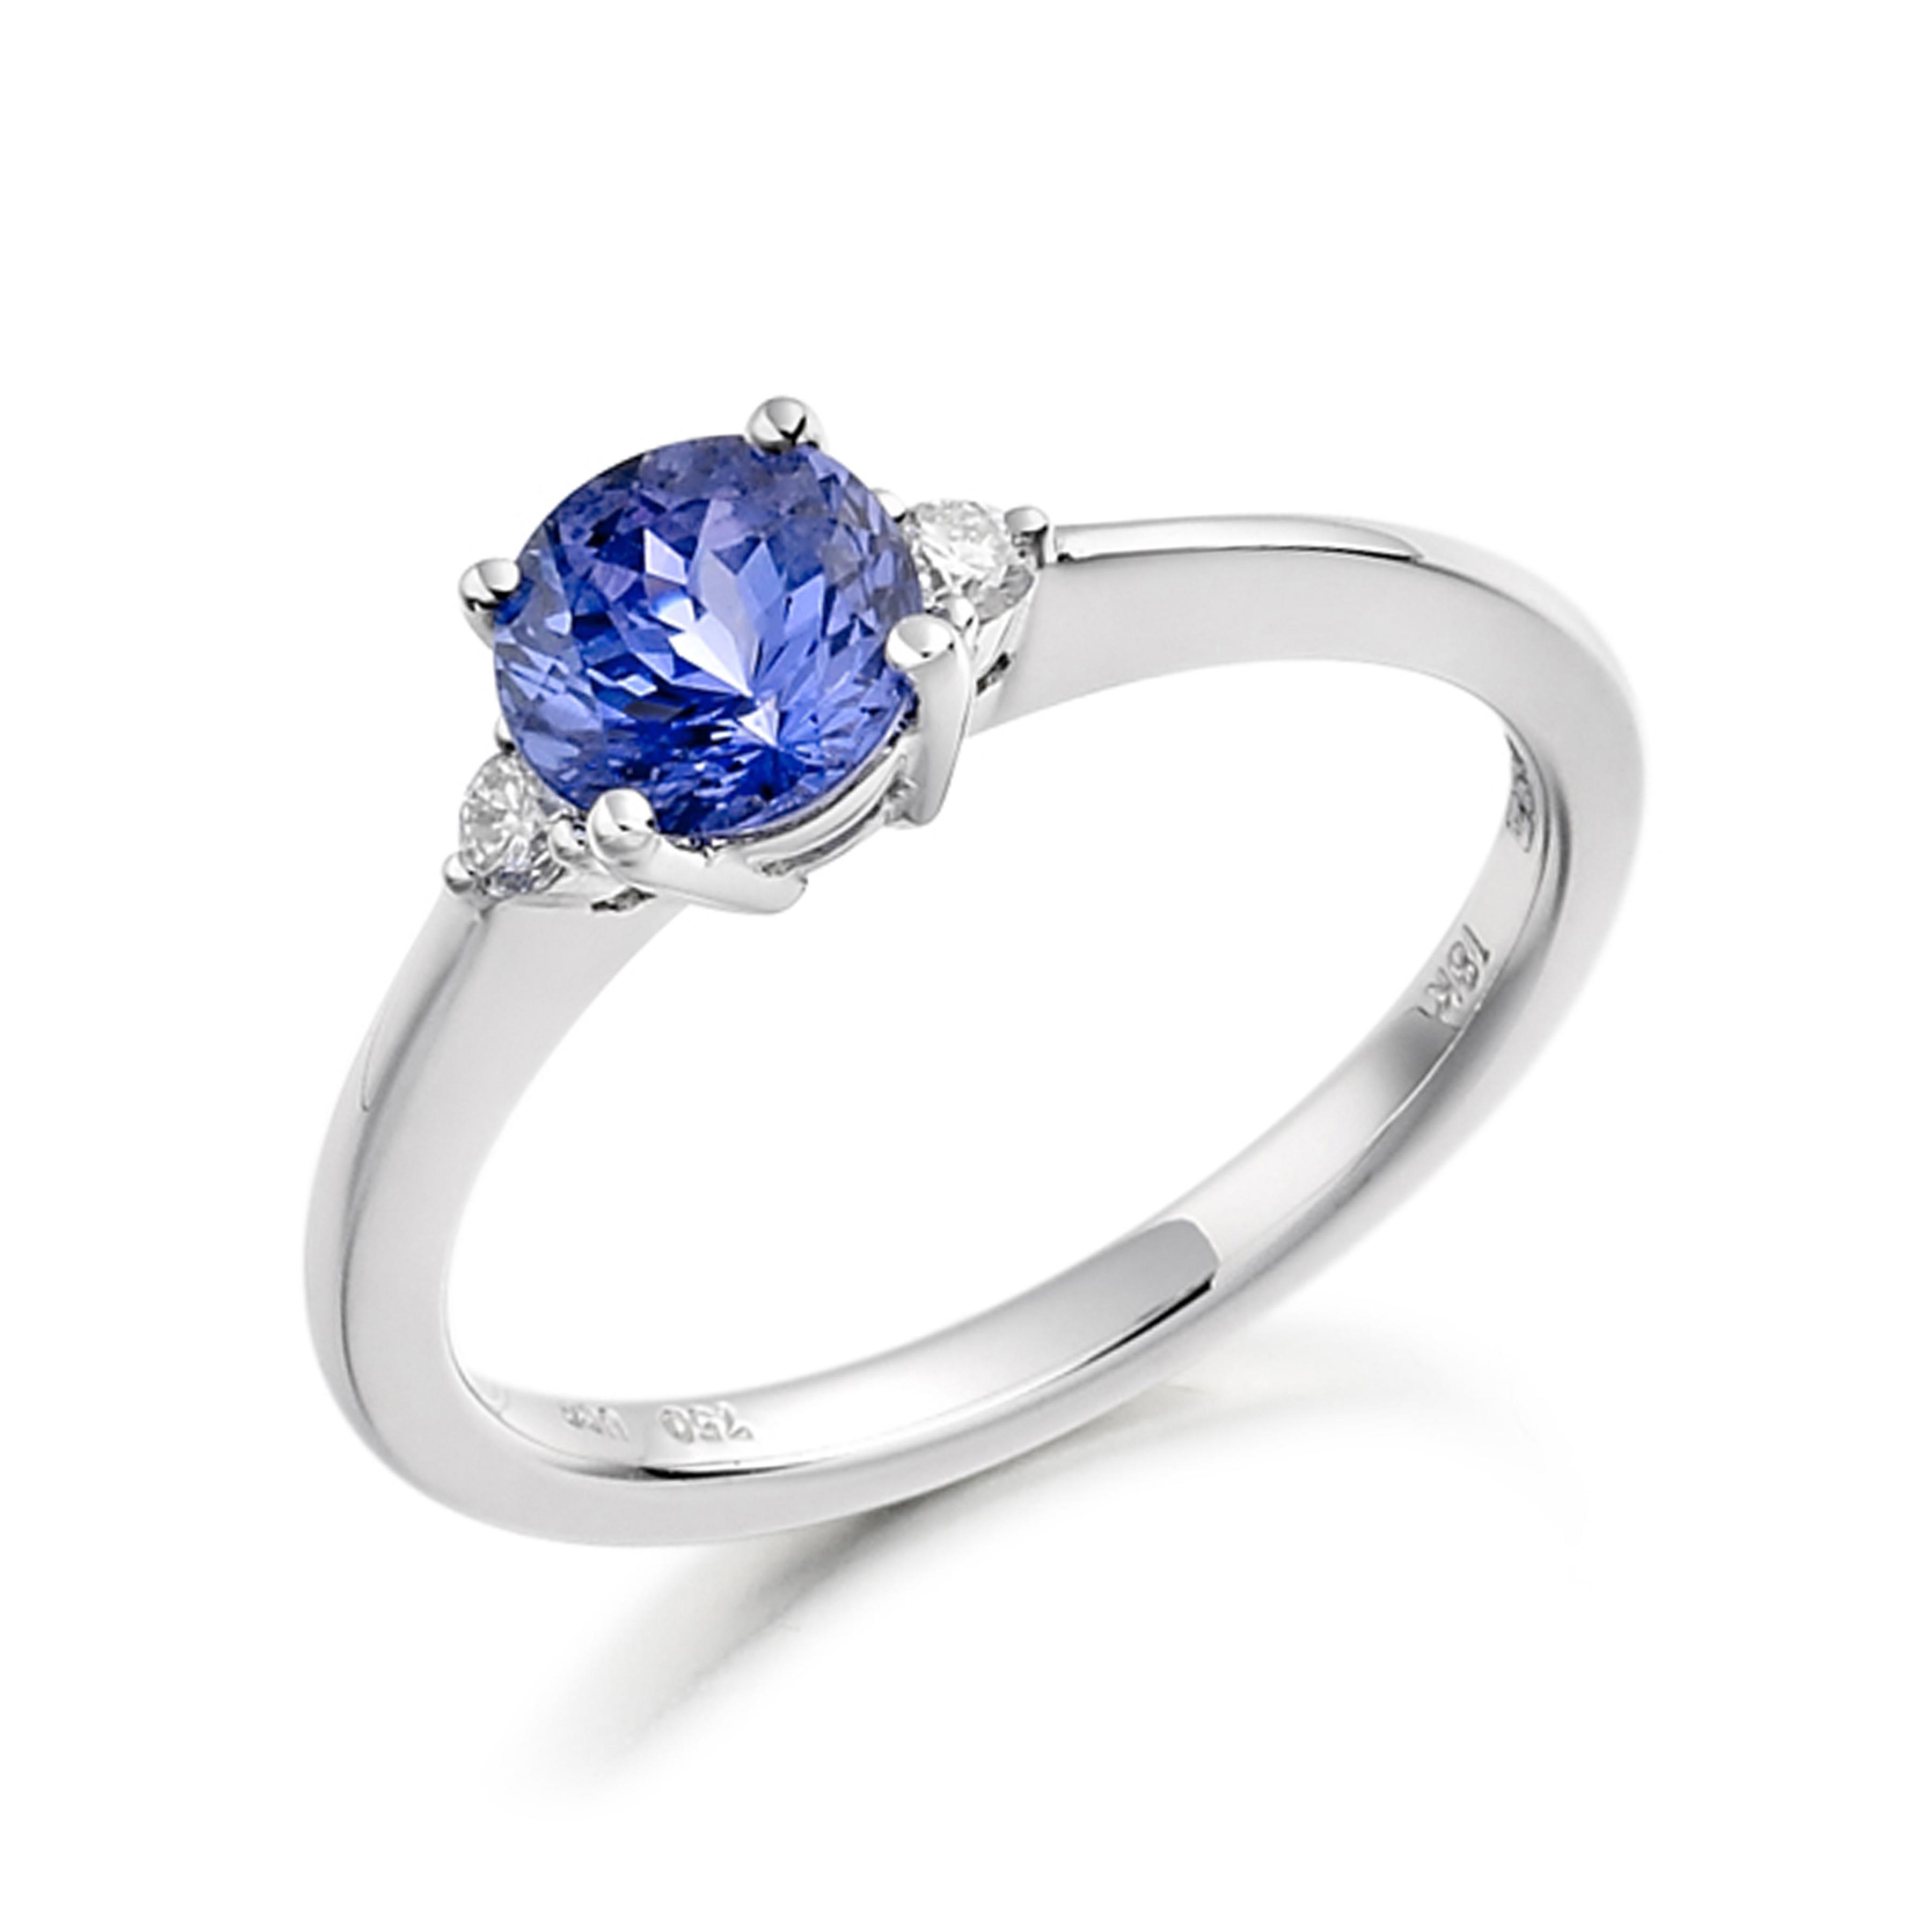 Milligrain Halo Diamond Cluster Diamond Ring (8.0mm)